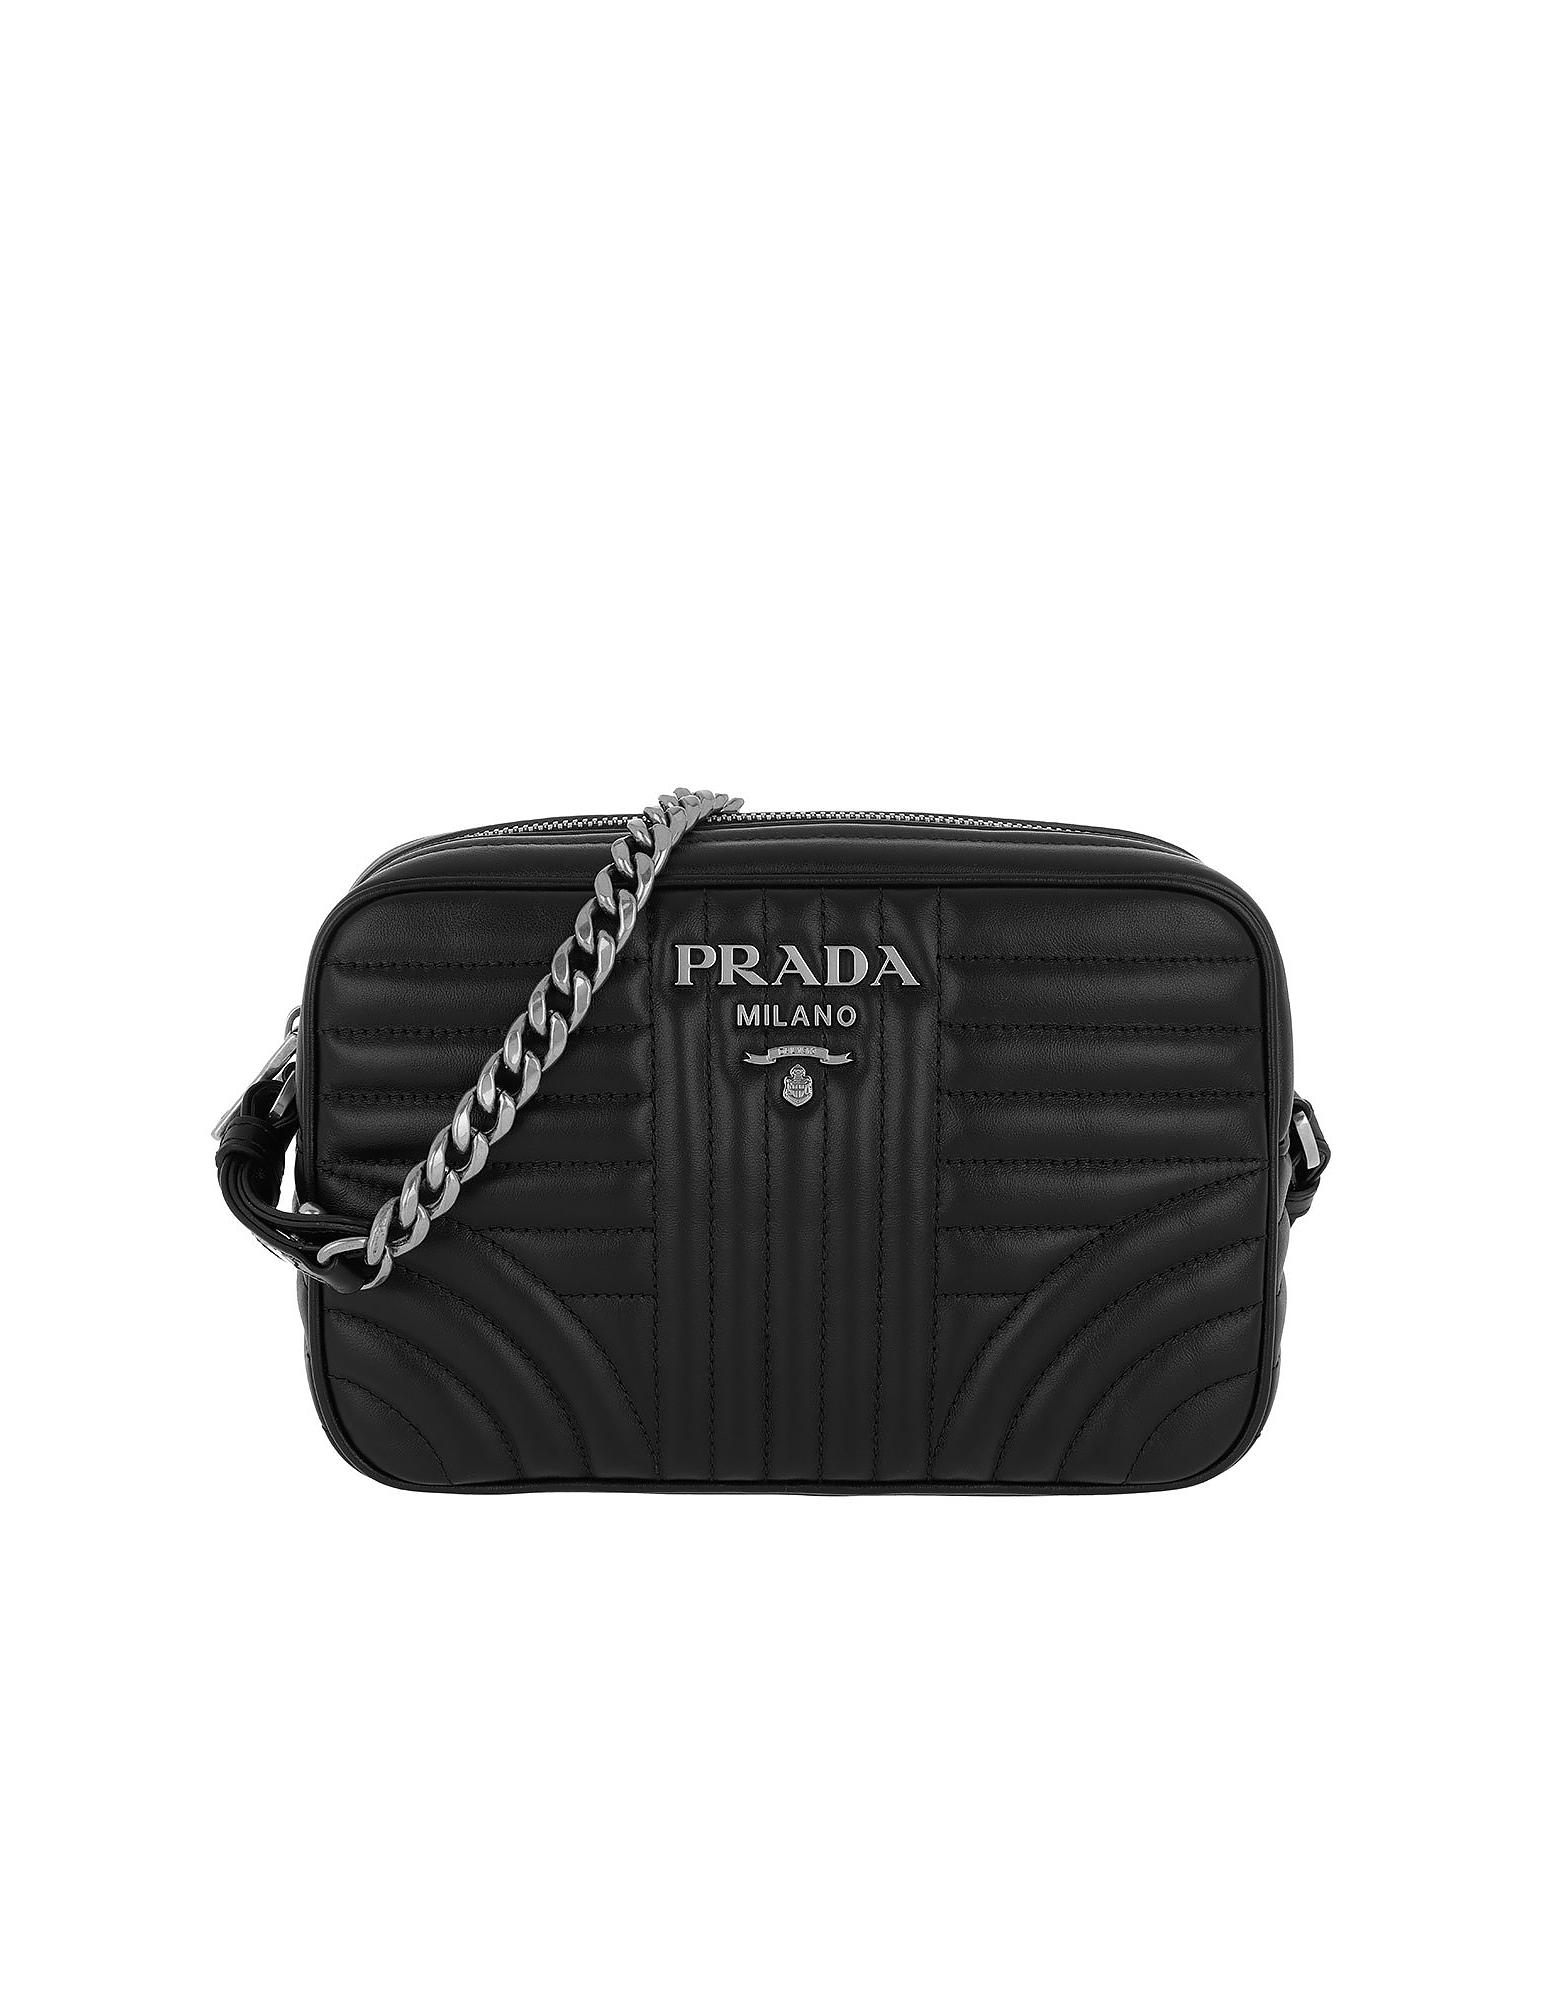 56f5c17e8073 Prada Diagramme Large Camera Bag Black2 in Black - Save 25% - Lyst